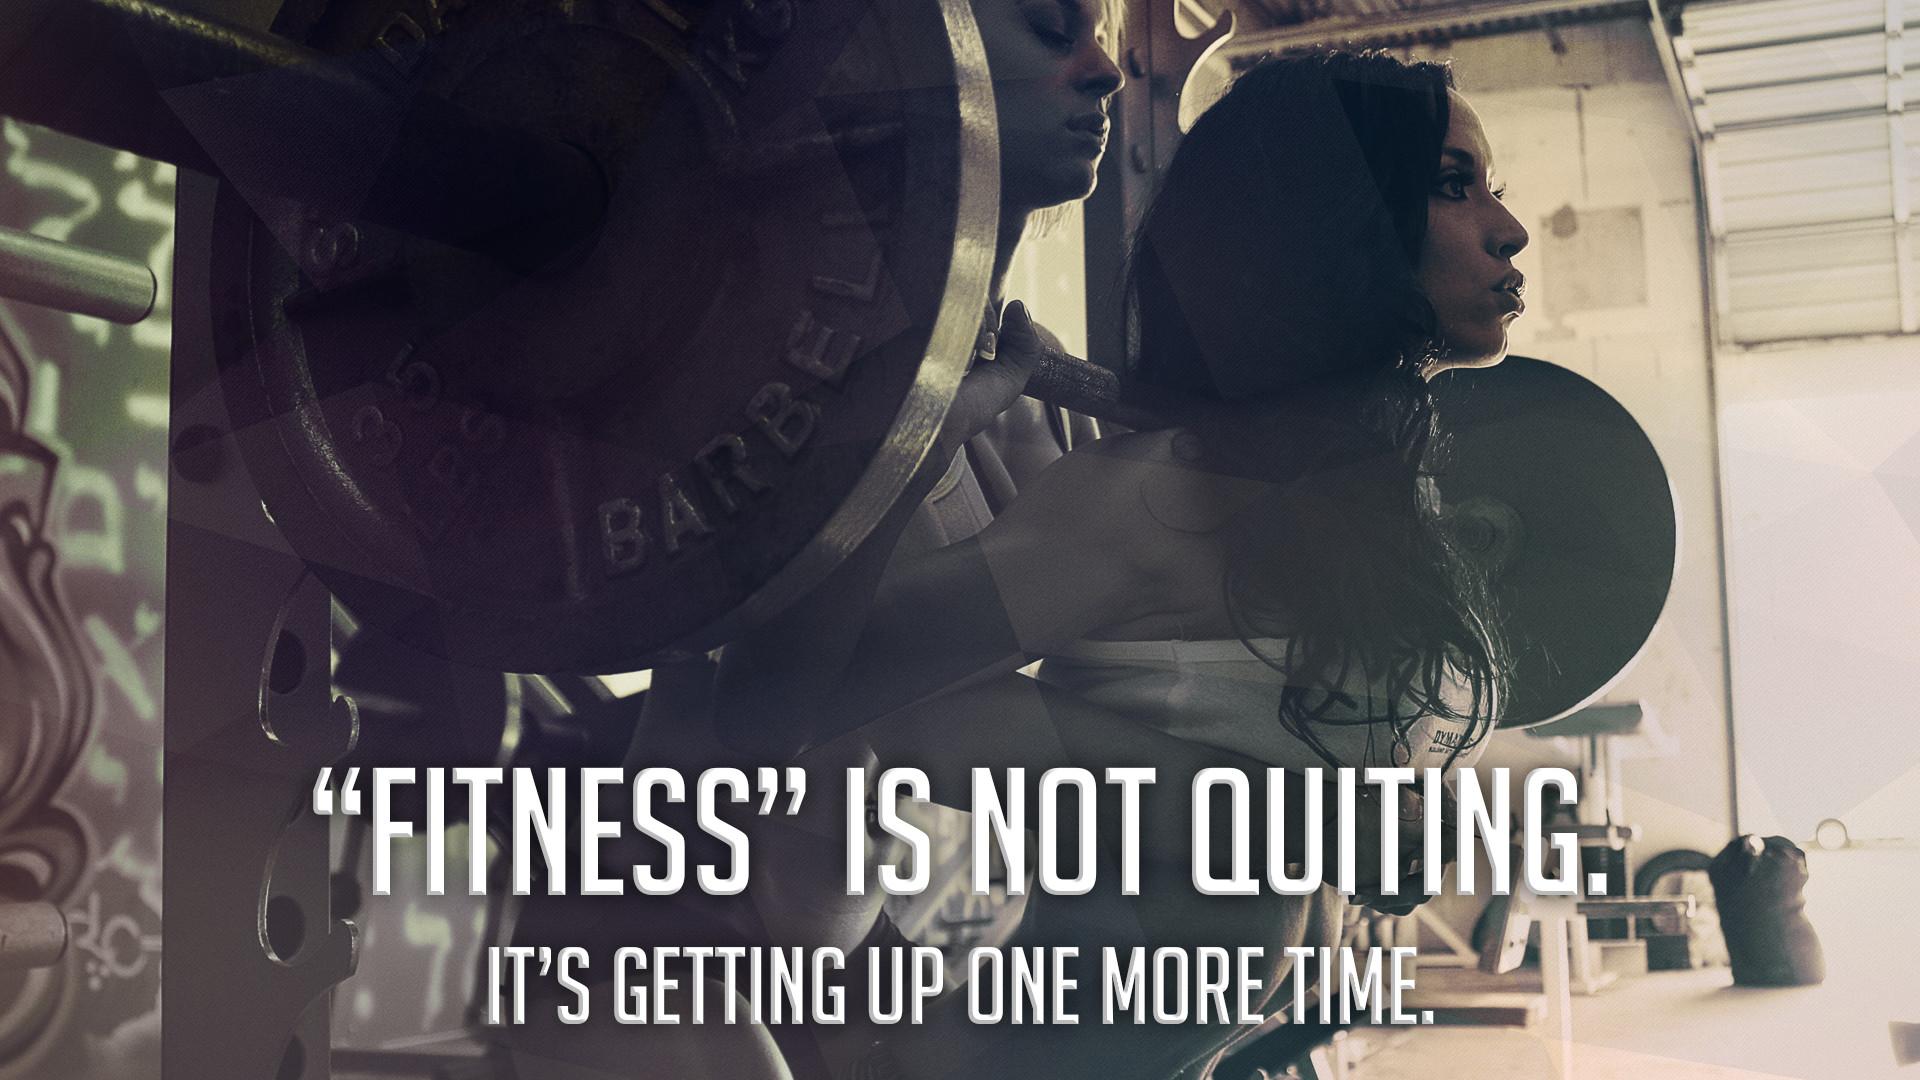 … fitness motivation wallpaper; fitness is not quiting wallpaper  walldevil …